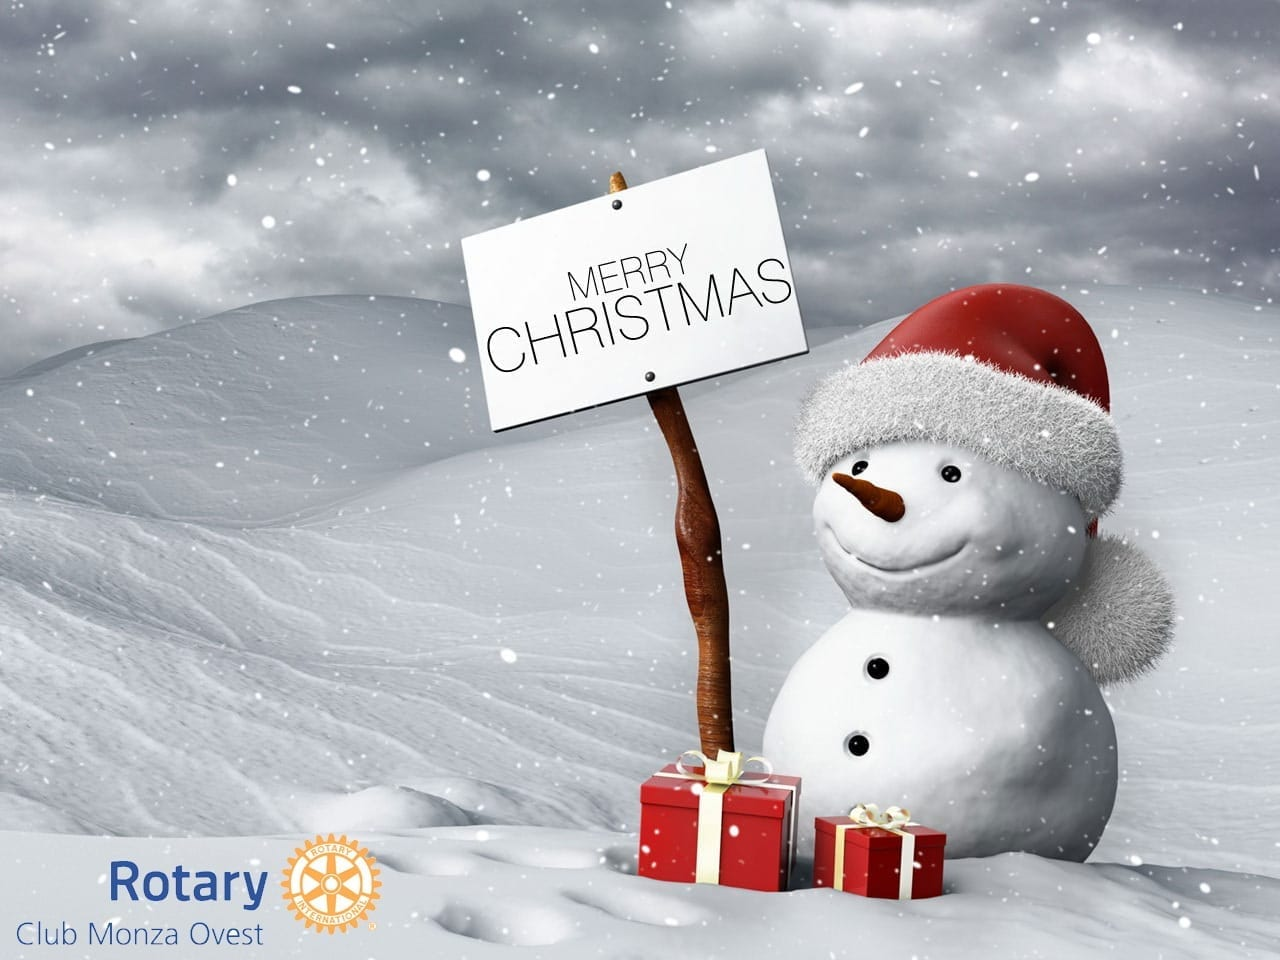 Merry-Christmas Rotary